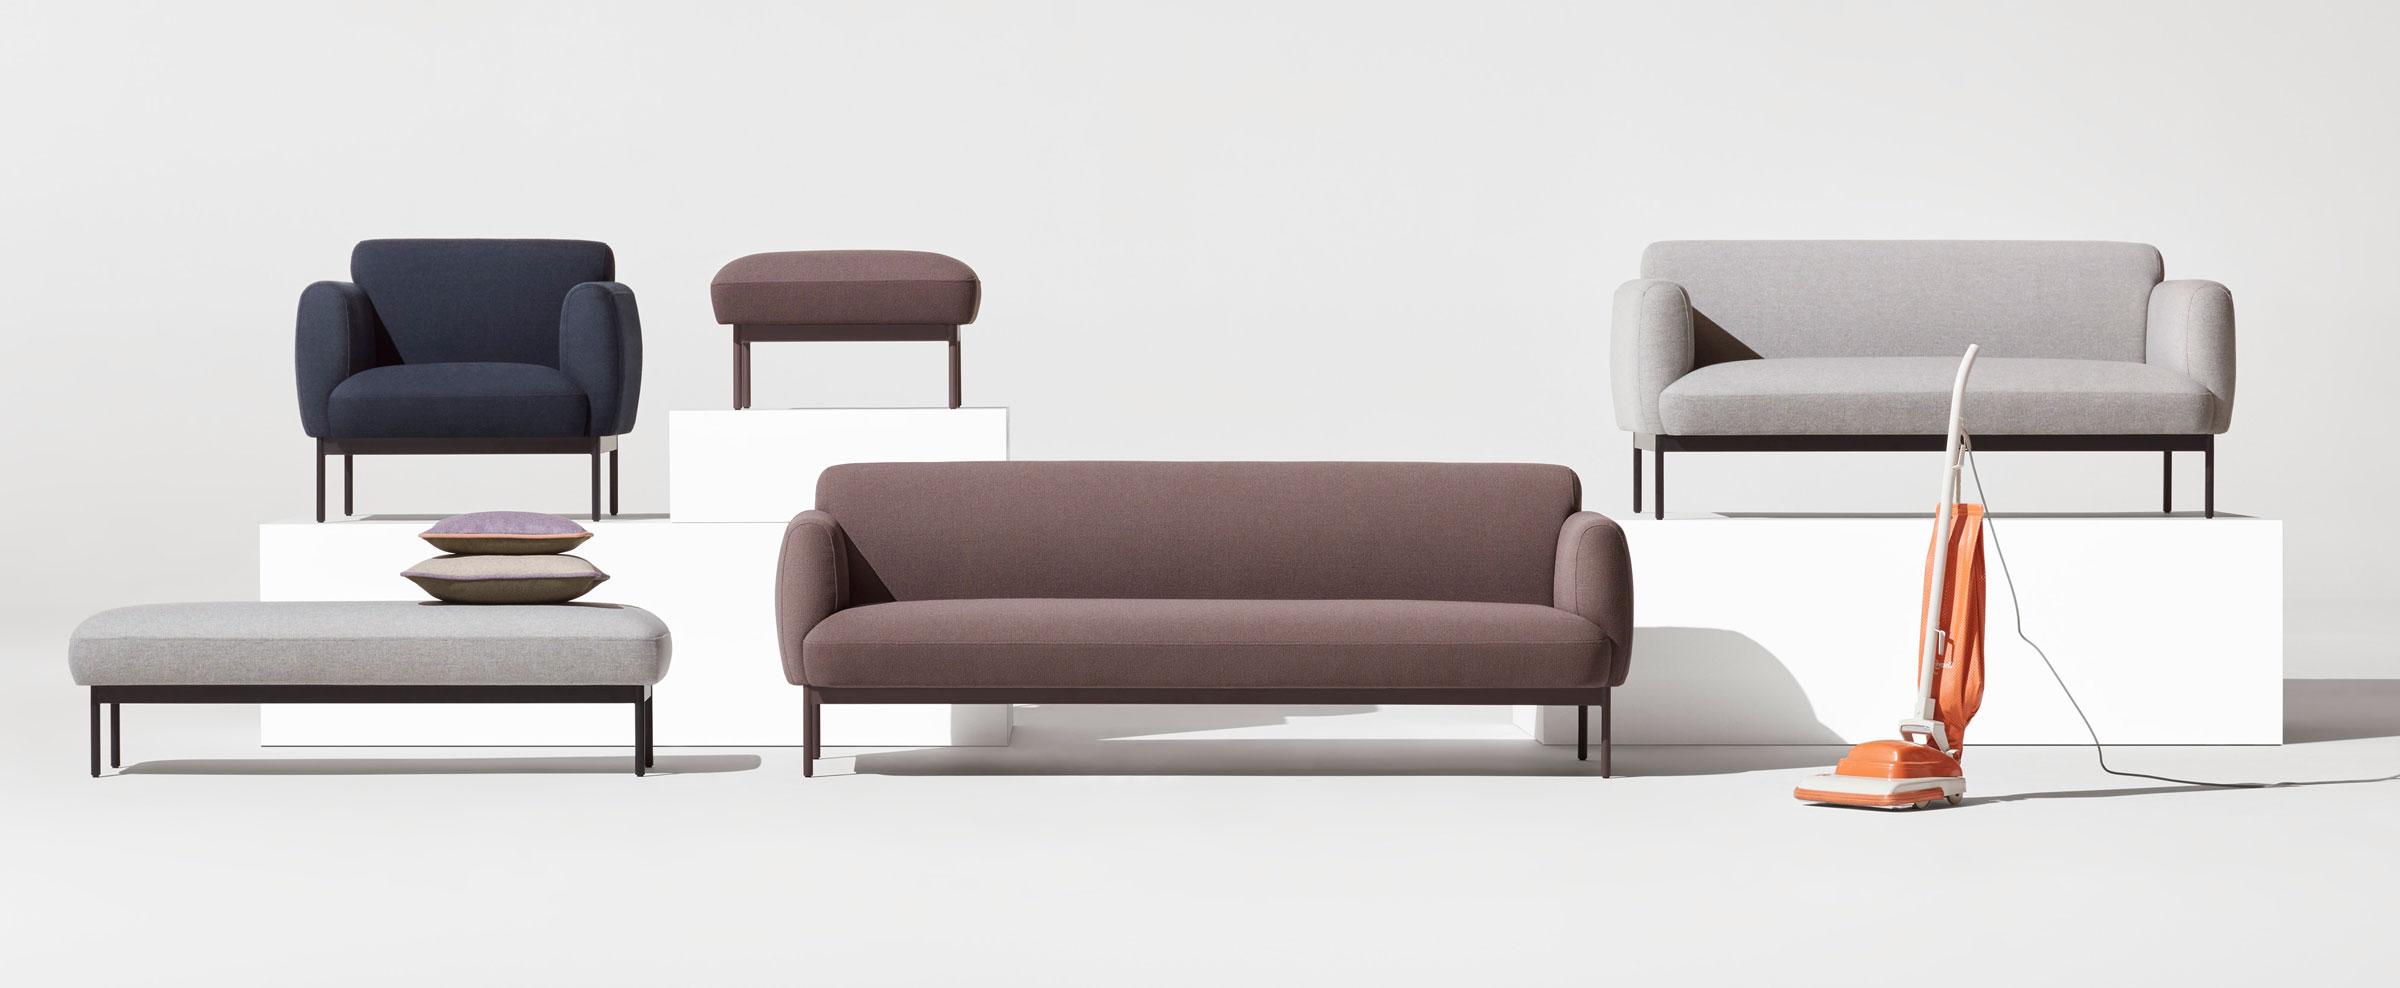 Sofa Puff Zwd9 Puff Puff sofa Contemporary Uphosltered sofa Blu Dot